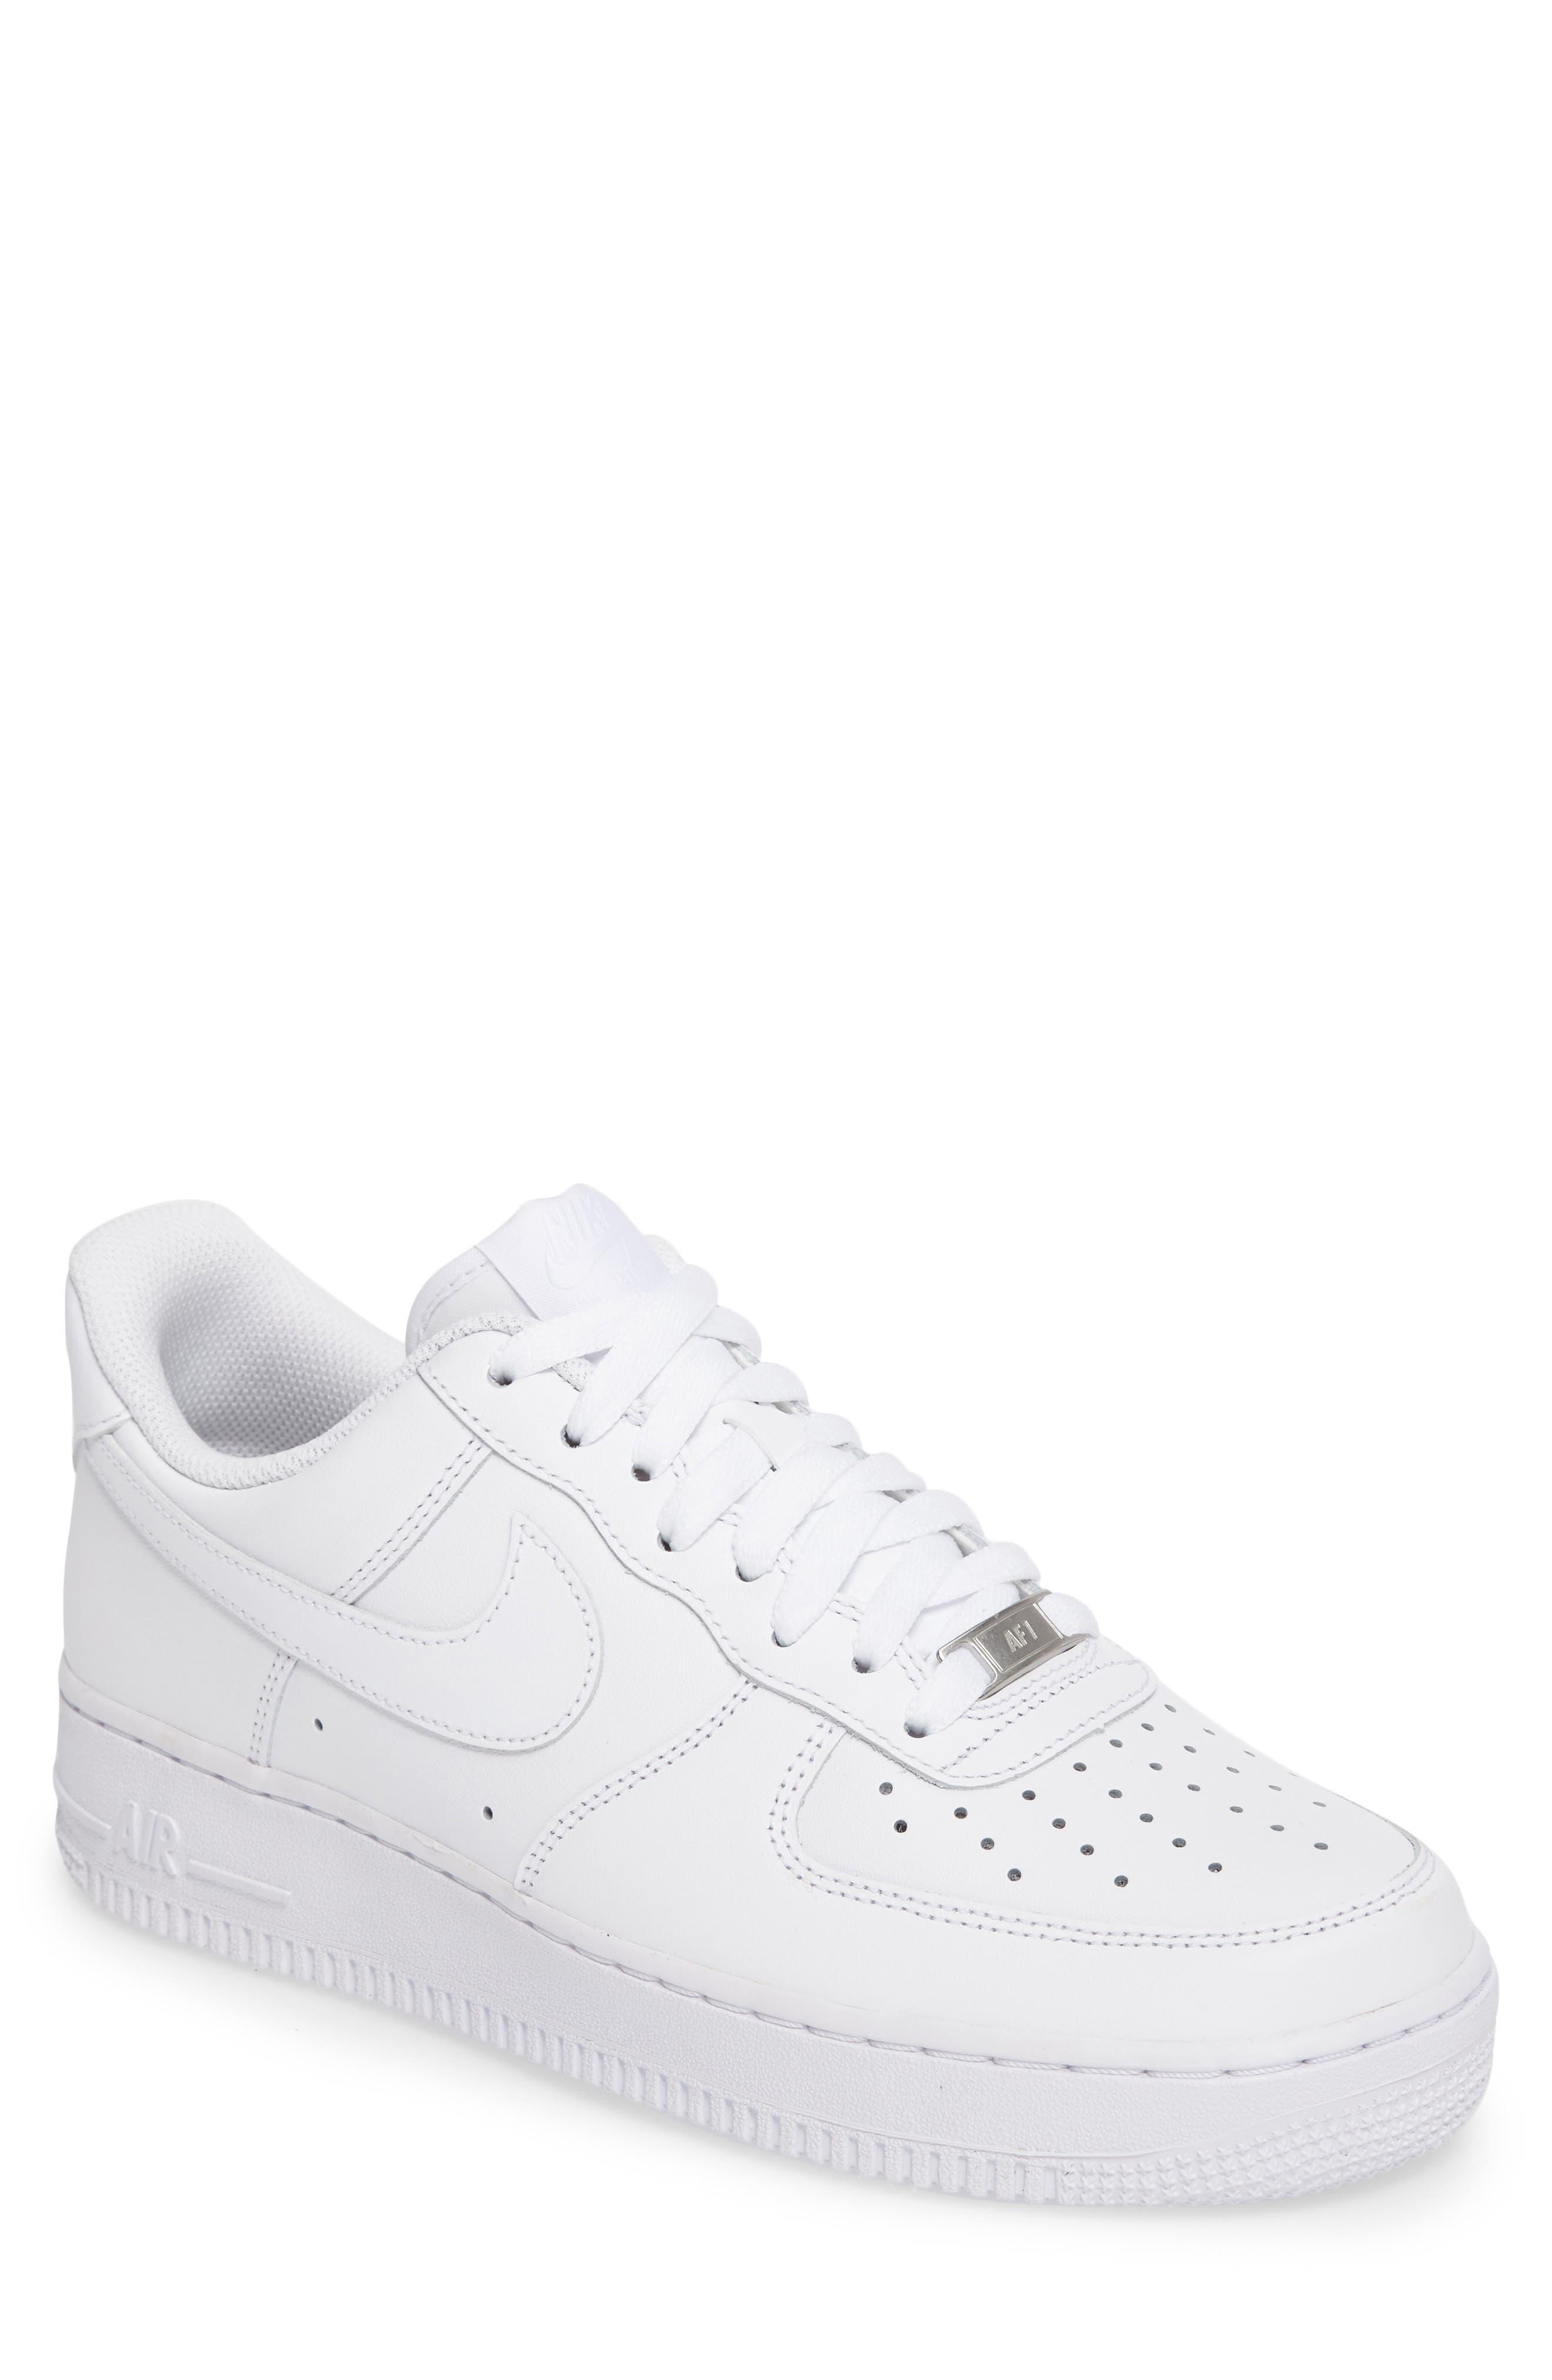 Air Force 1 '07 Sneaker,                             Main thumbnail 1, color,                             White/ White